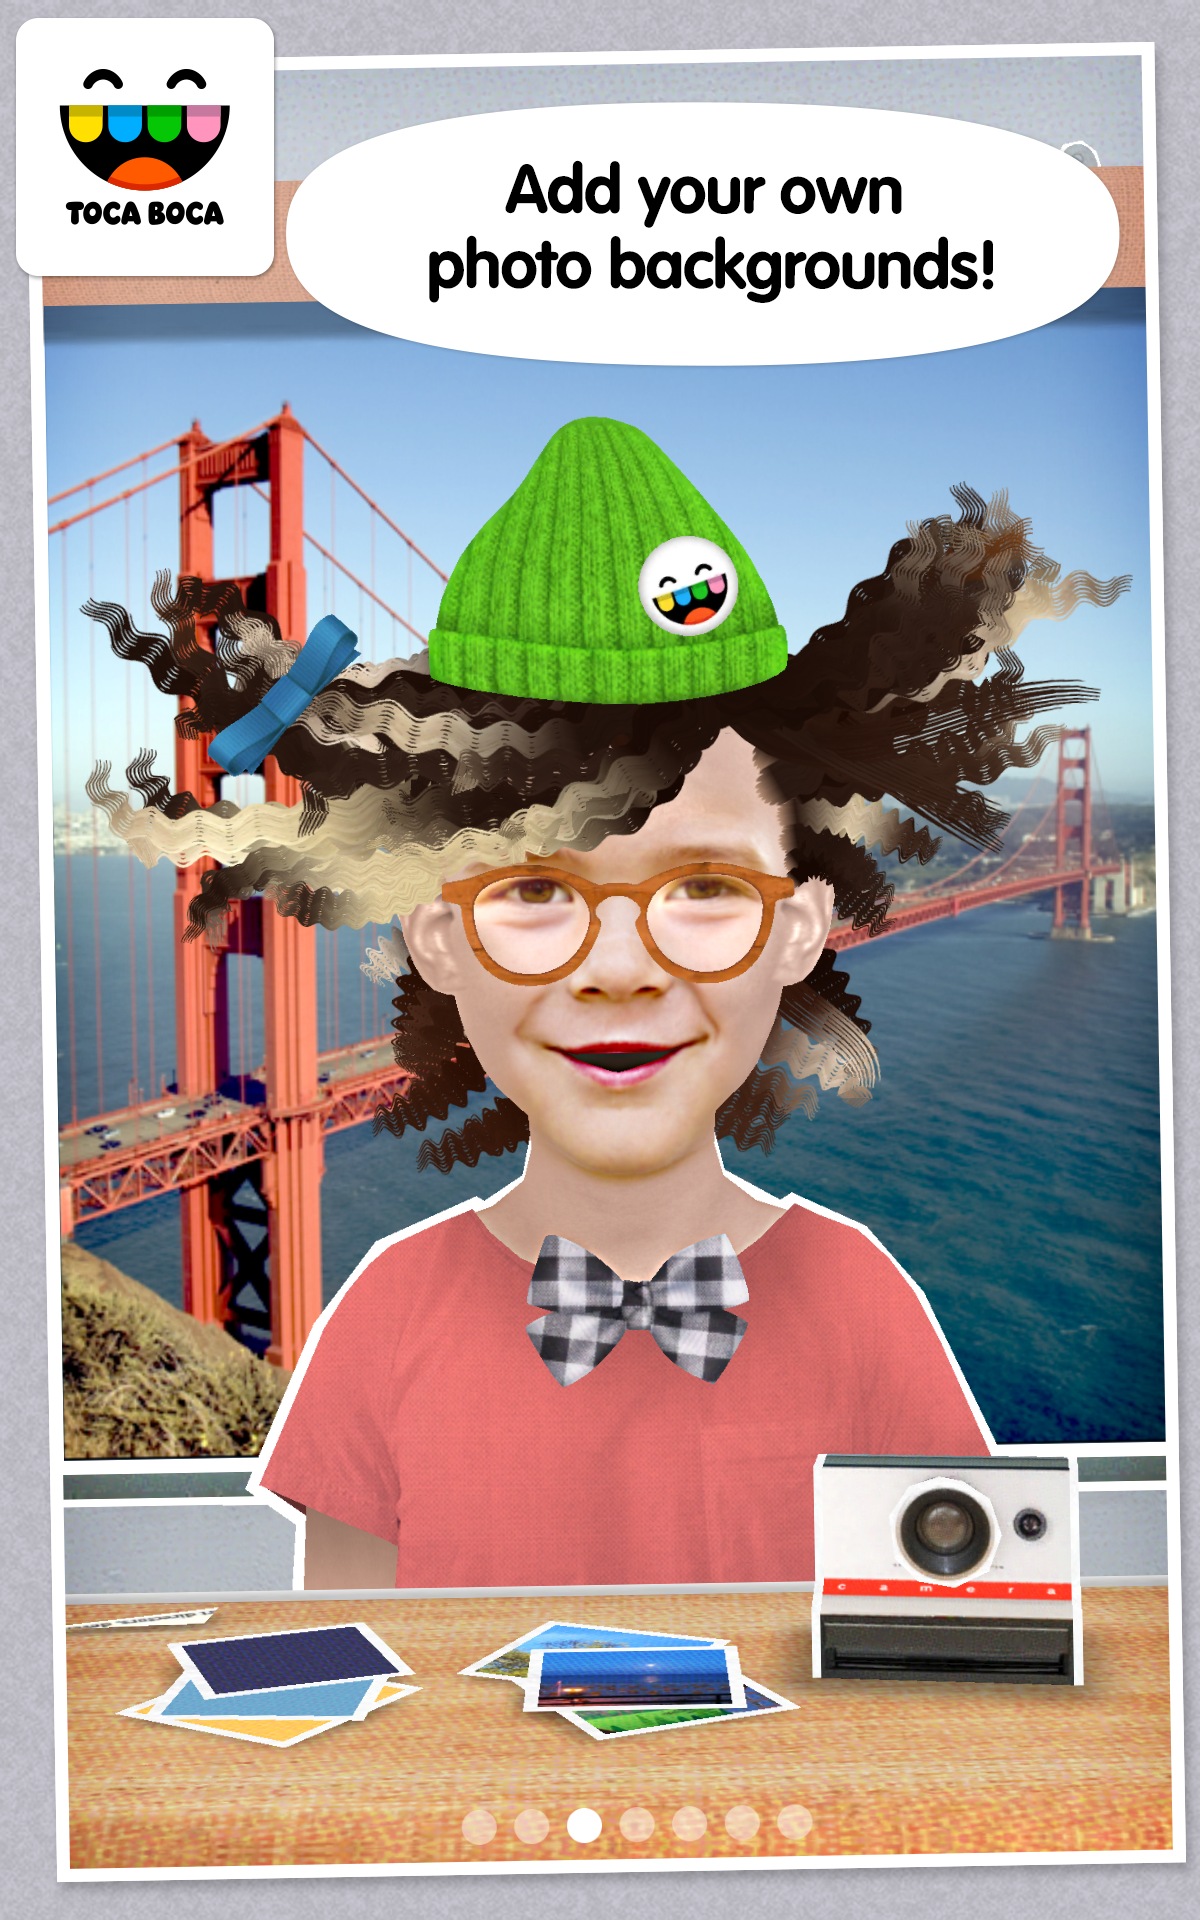 Toca Hair Salon Me: Amazon.es: Appstore para Android